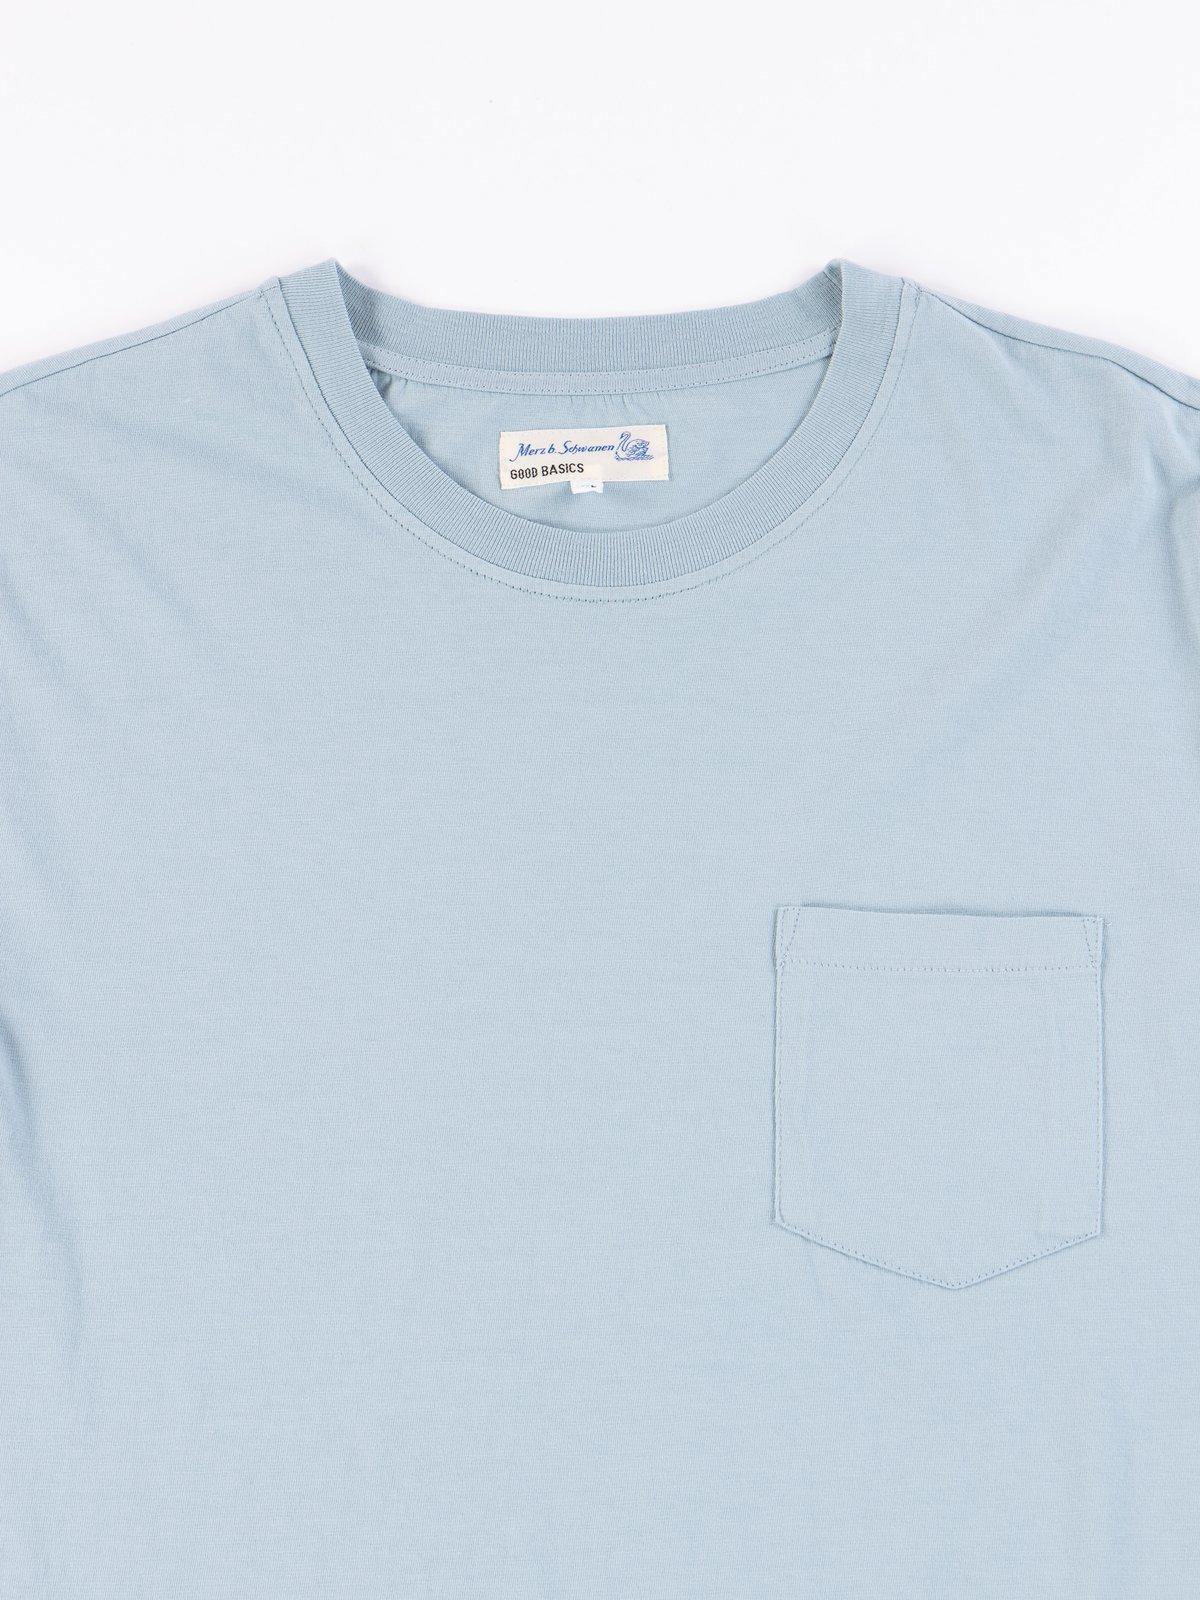 Pale Blue Good Basics CTP01 Pocket Crew Neck Tee - Image 3